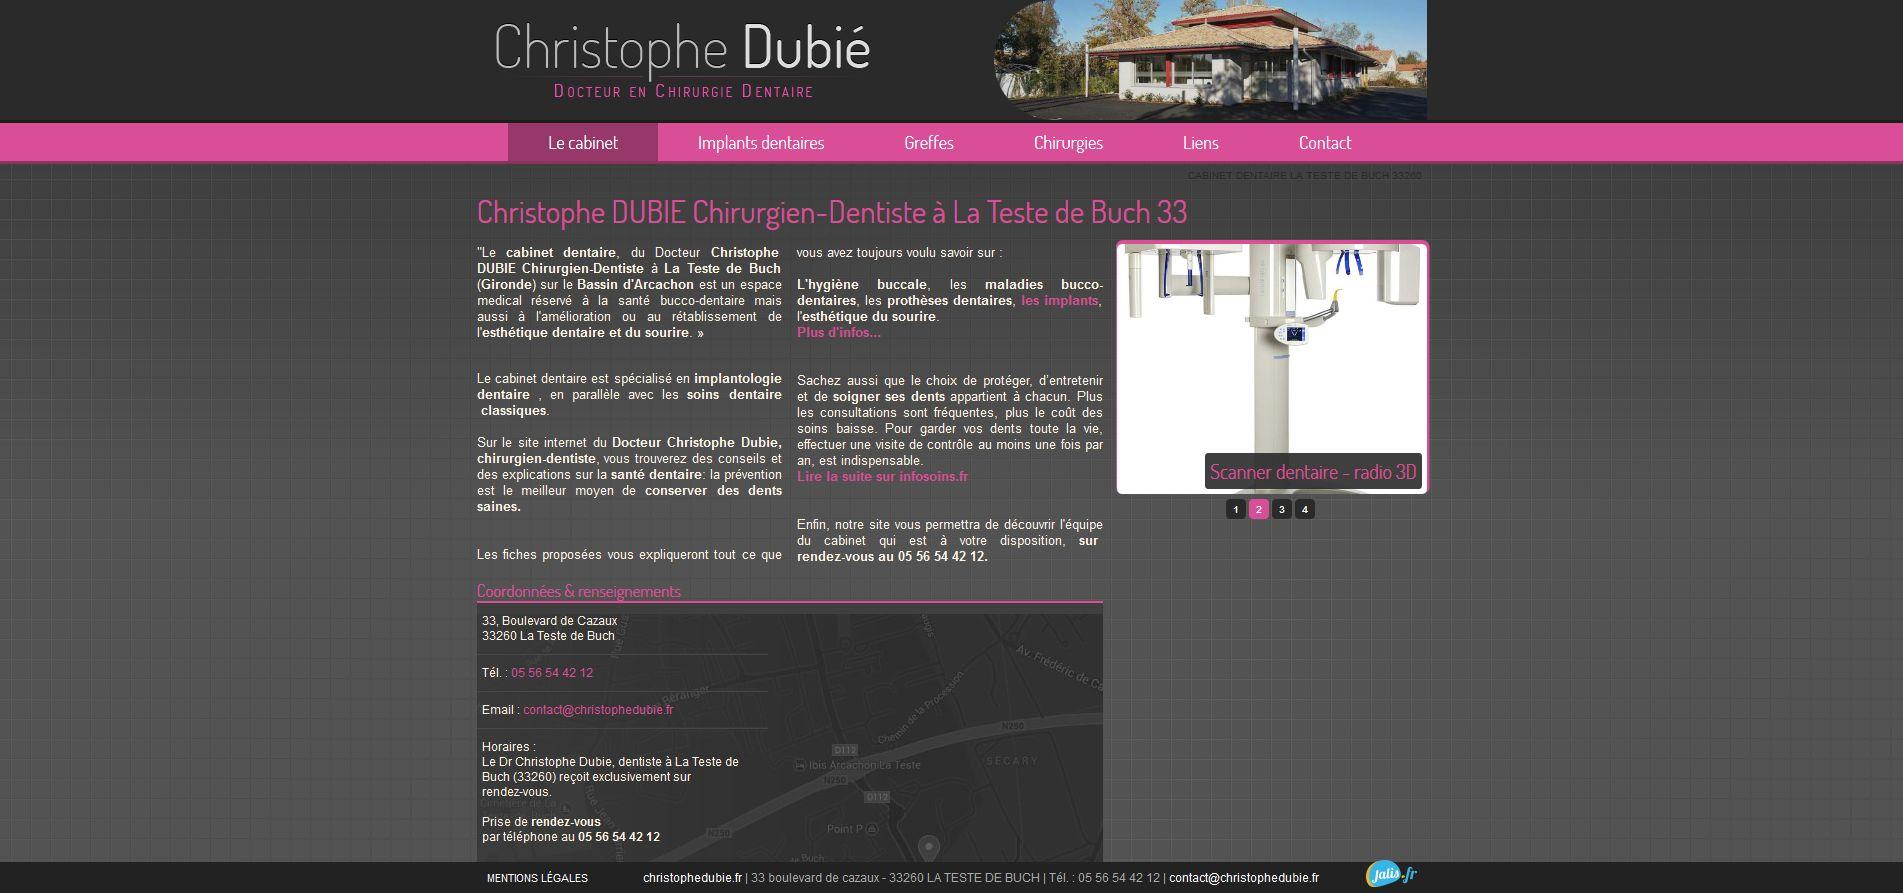 christophe dubi chirurgien dentiste la teste de buch. Black Bedroom Furniture Sets. Home Design Ideas